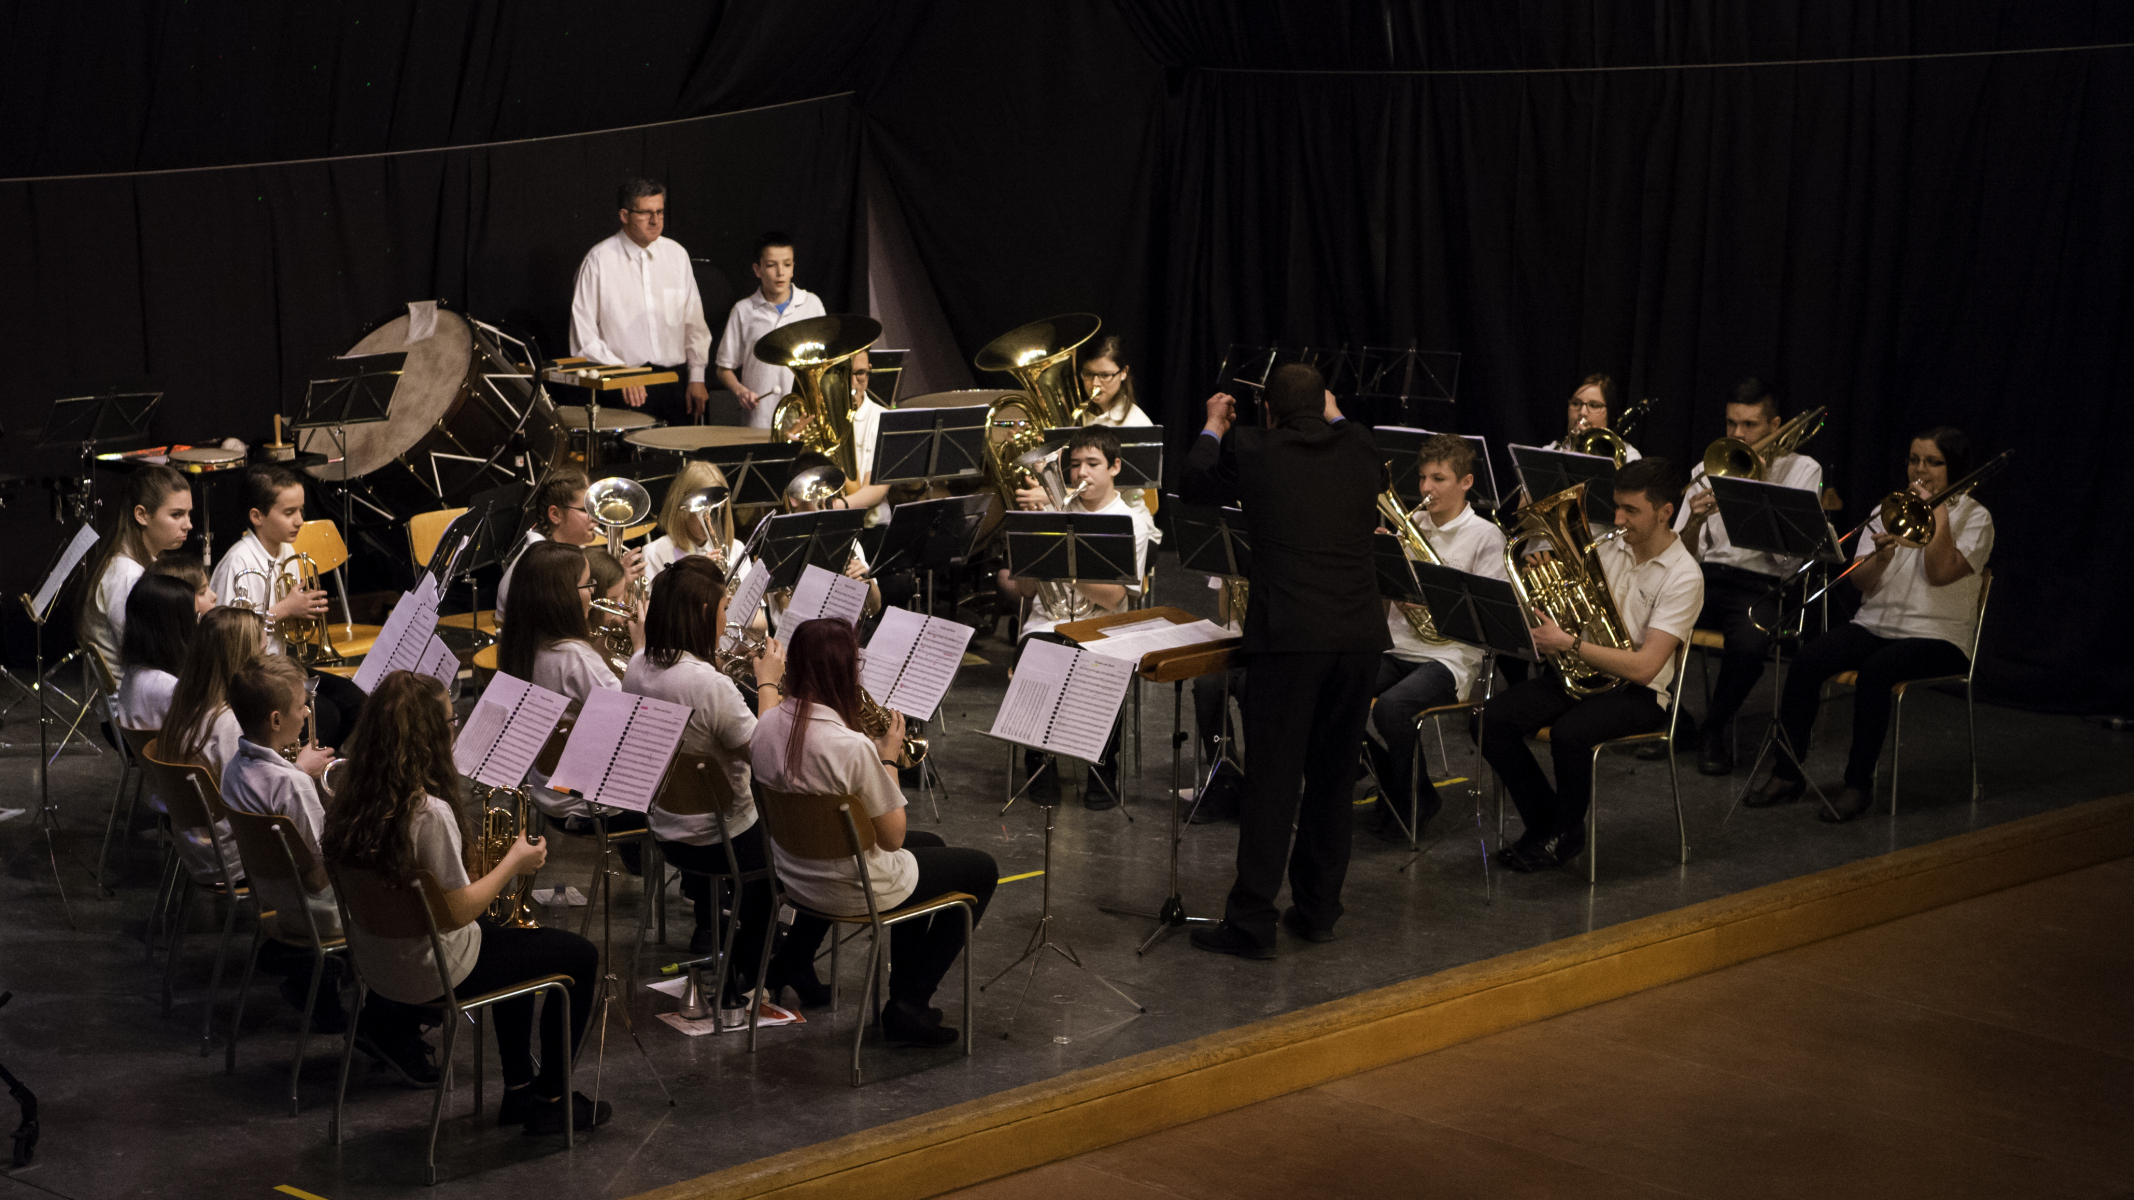 170211_concert_annuel17-027